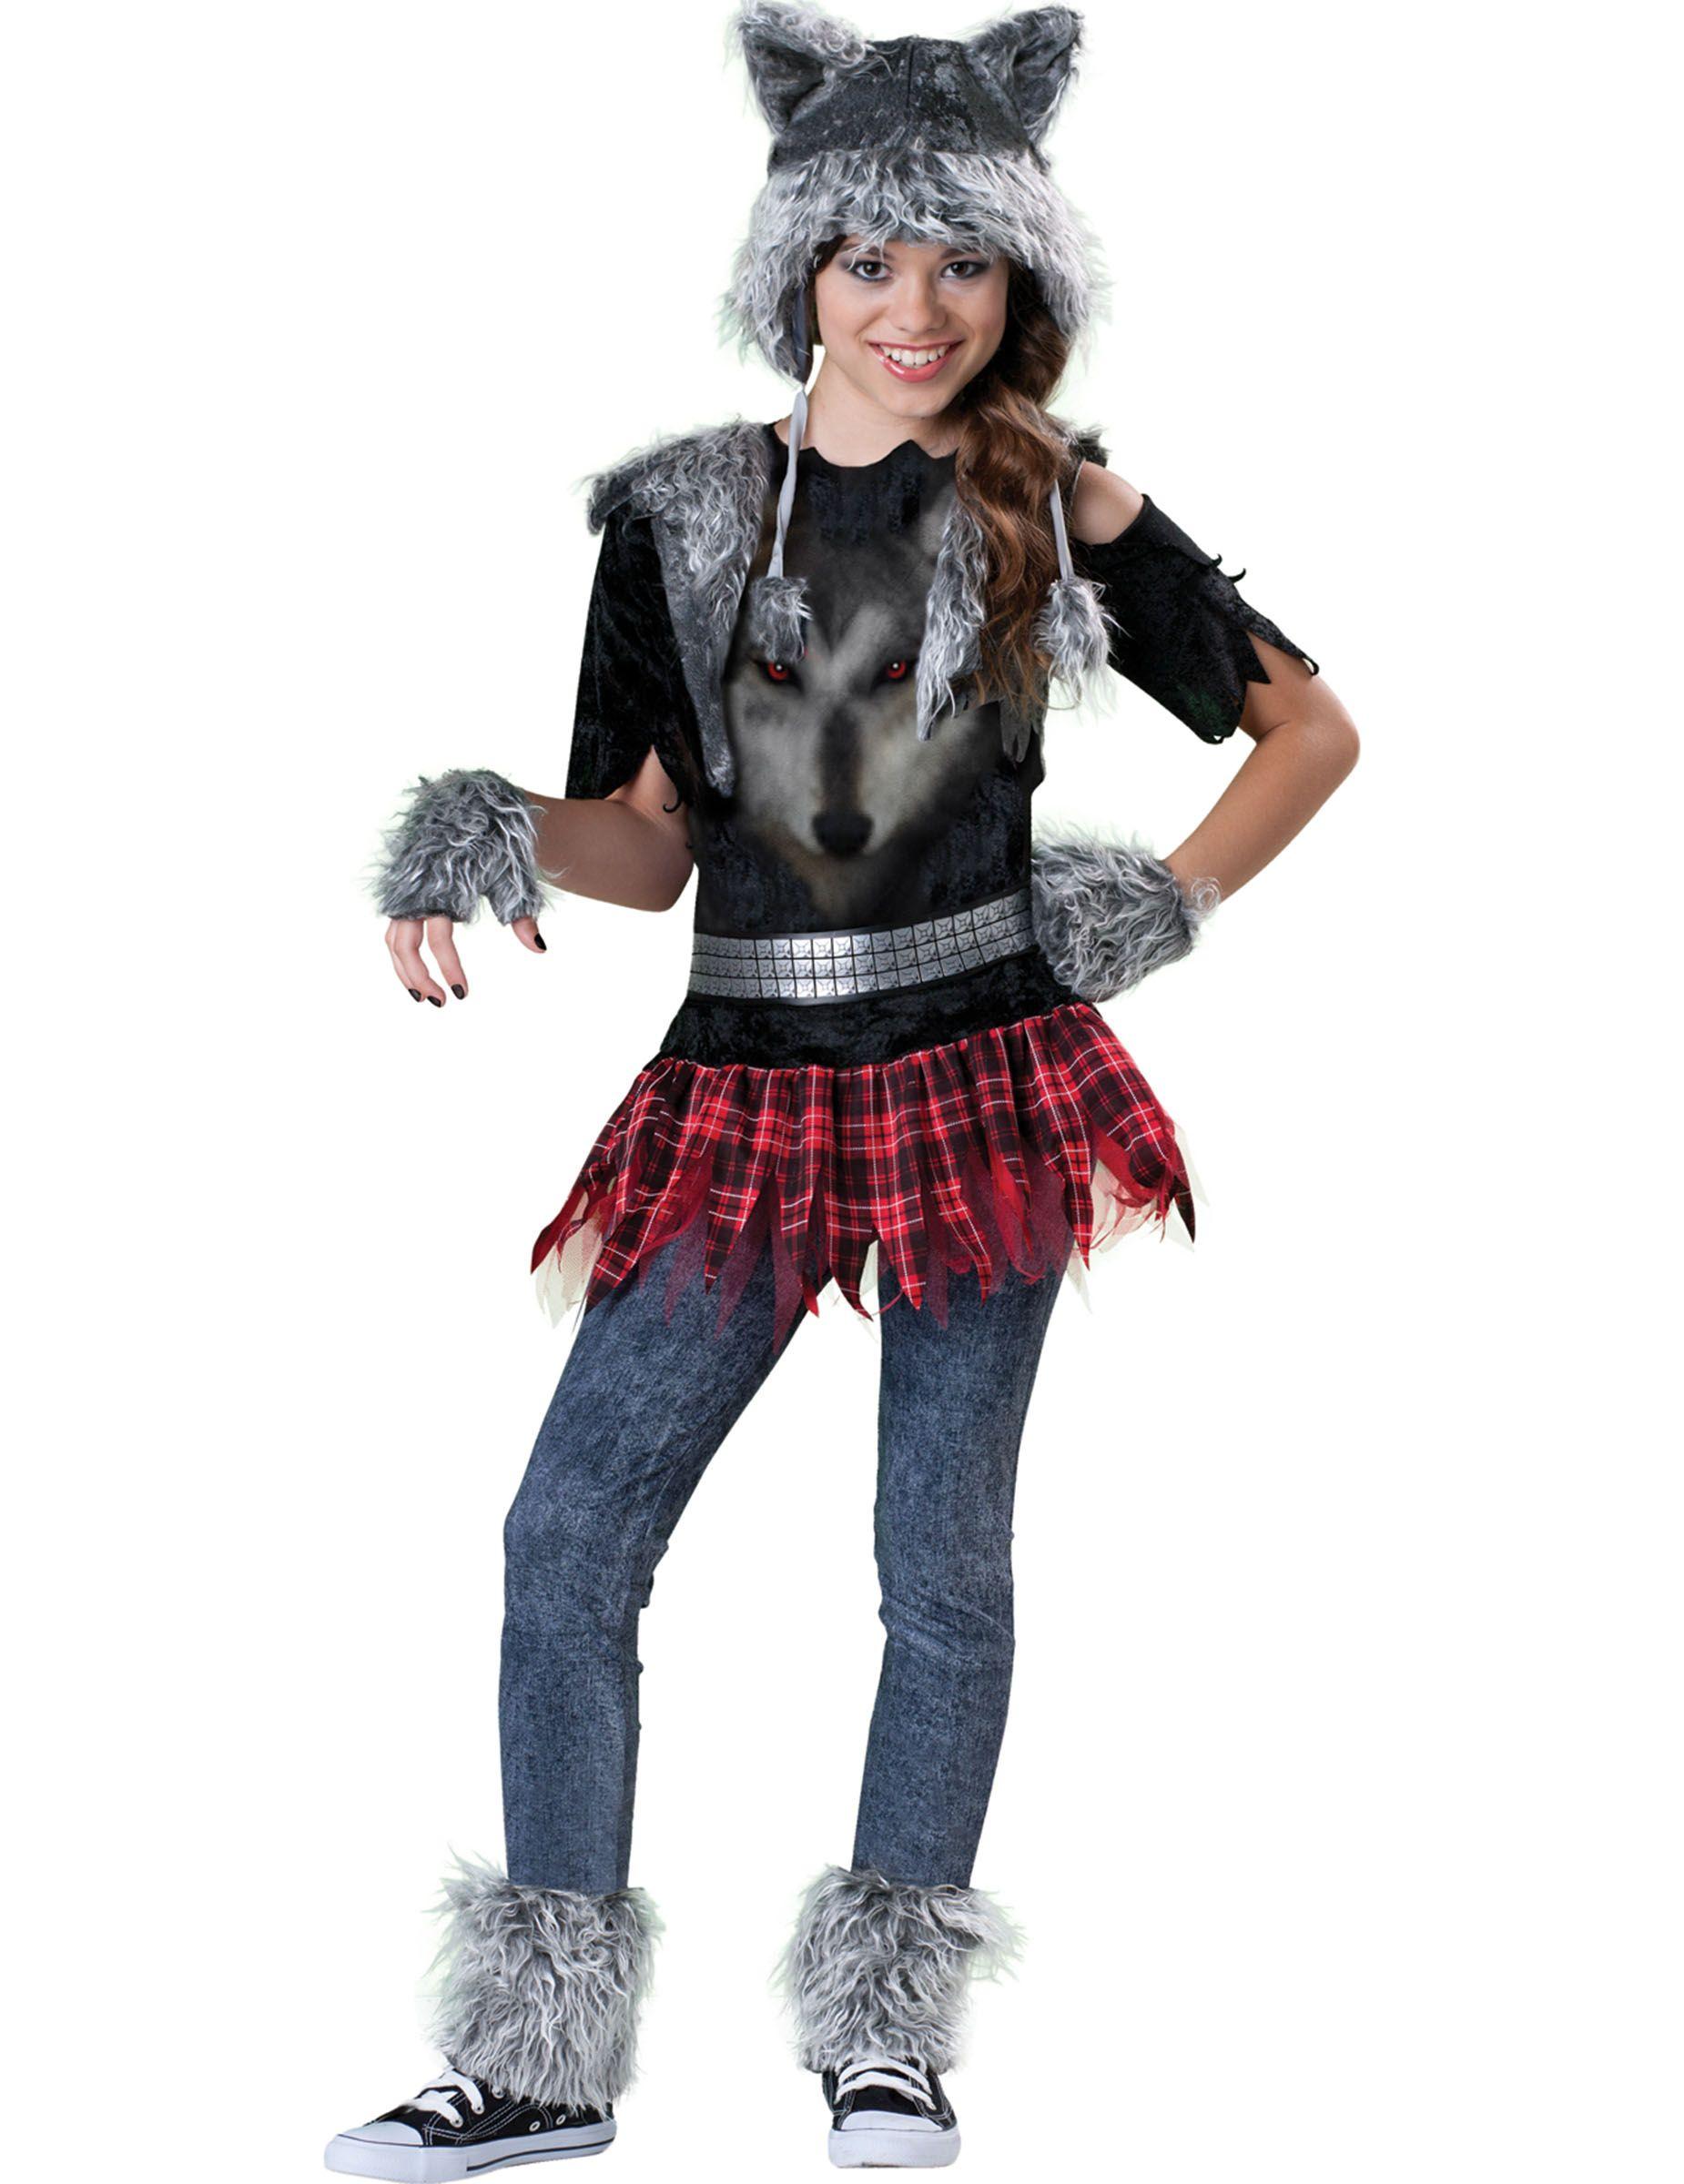 Halloween Kostuum Nl.Wolf Kostuum Voor Meisjes Premium Shrek Wolf Kostuum